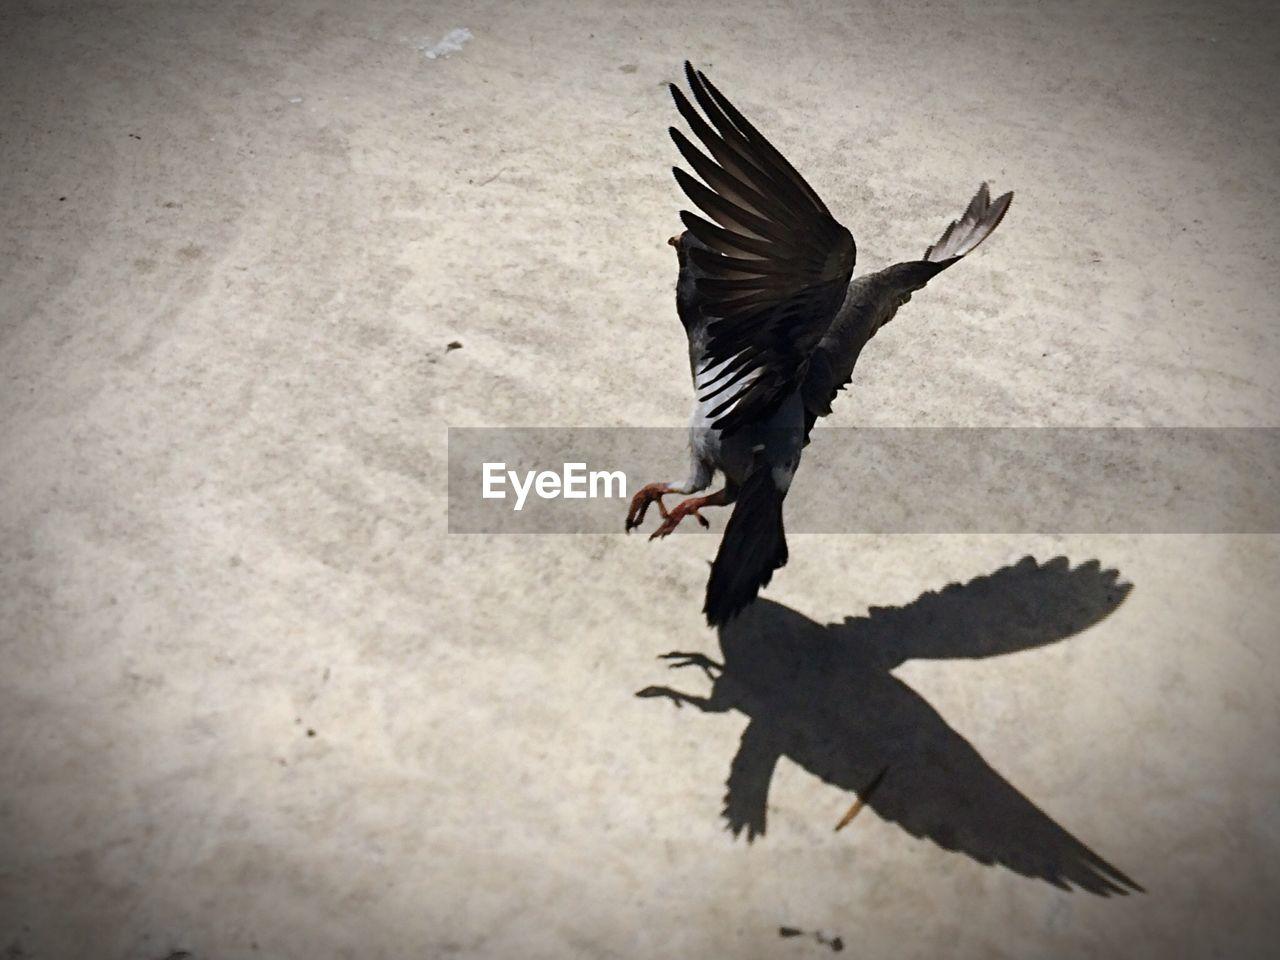 Pigeon landing on ground